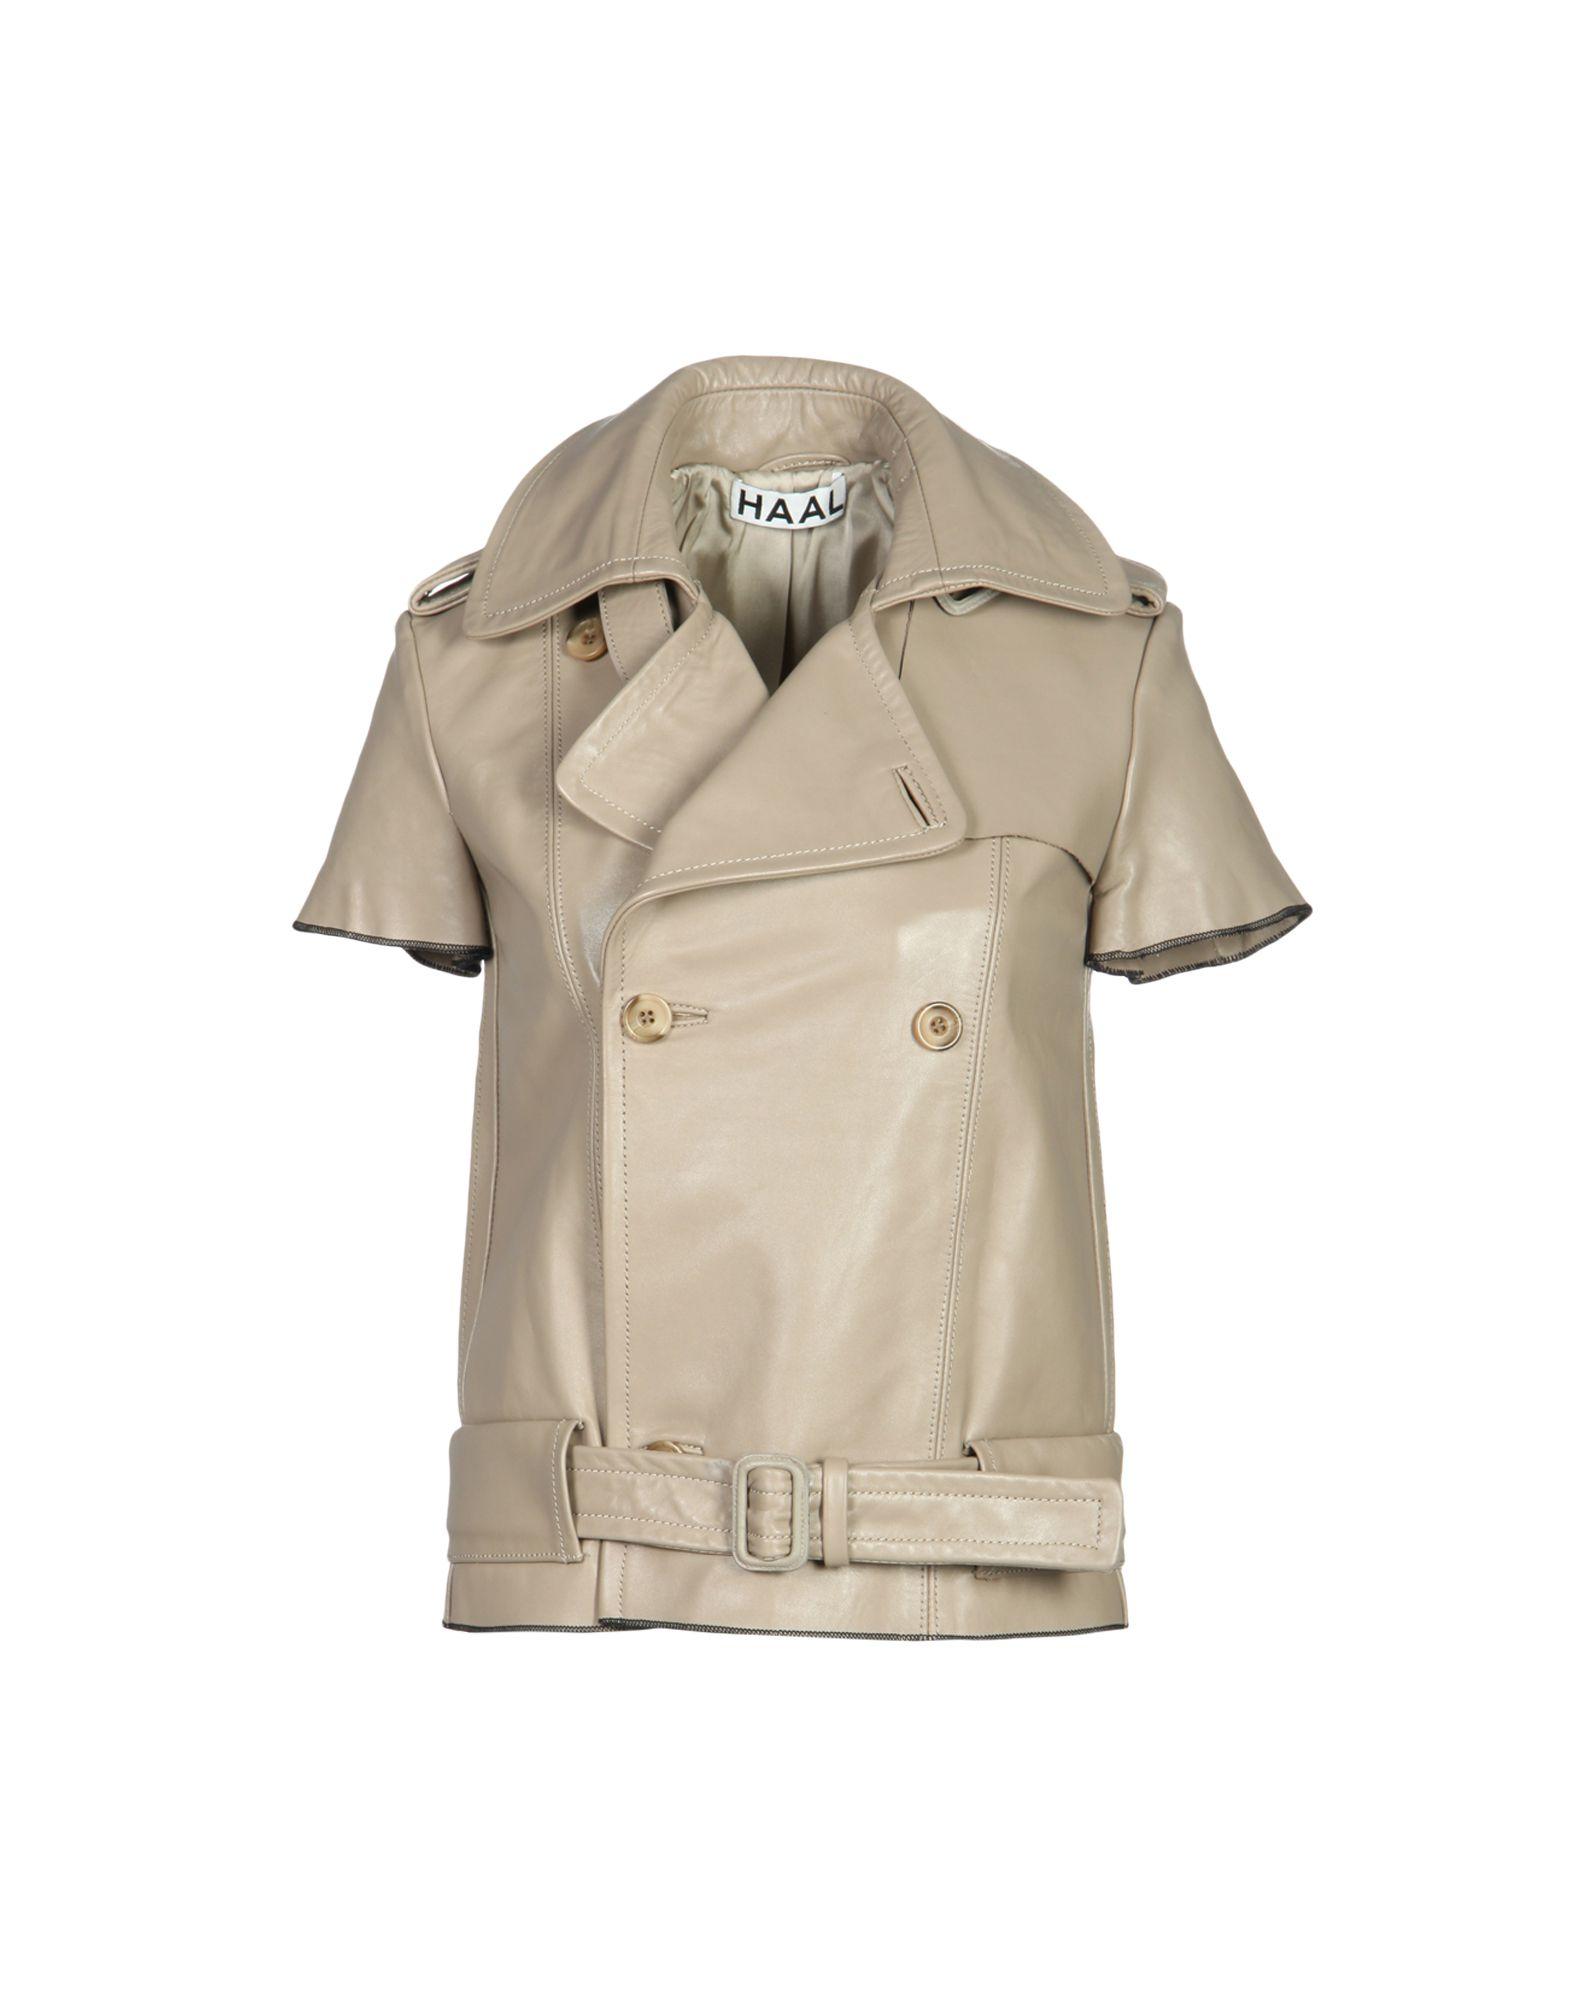 HAAL Jackets in Light Brown